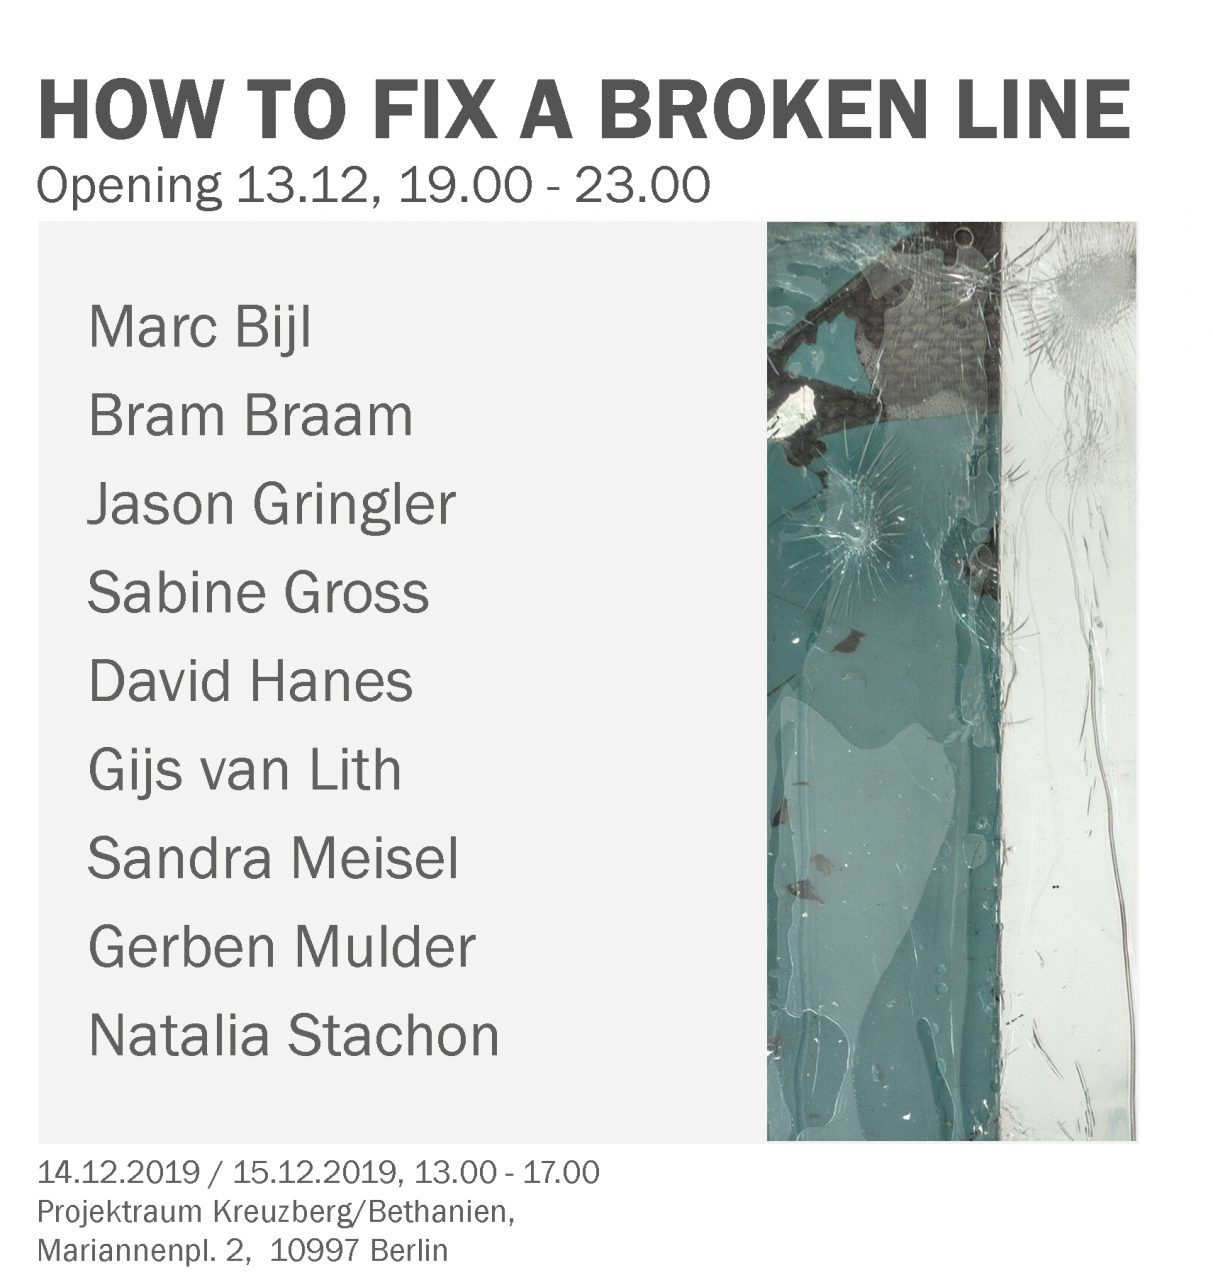 How to fix a broken line